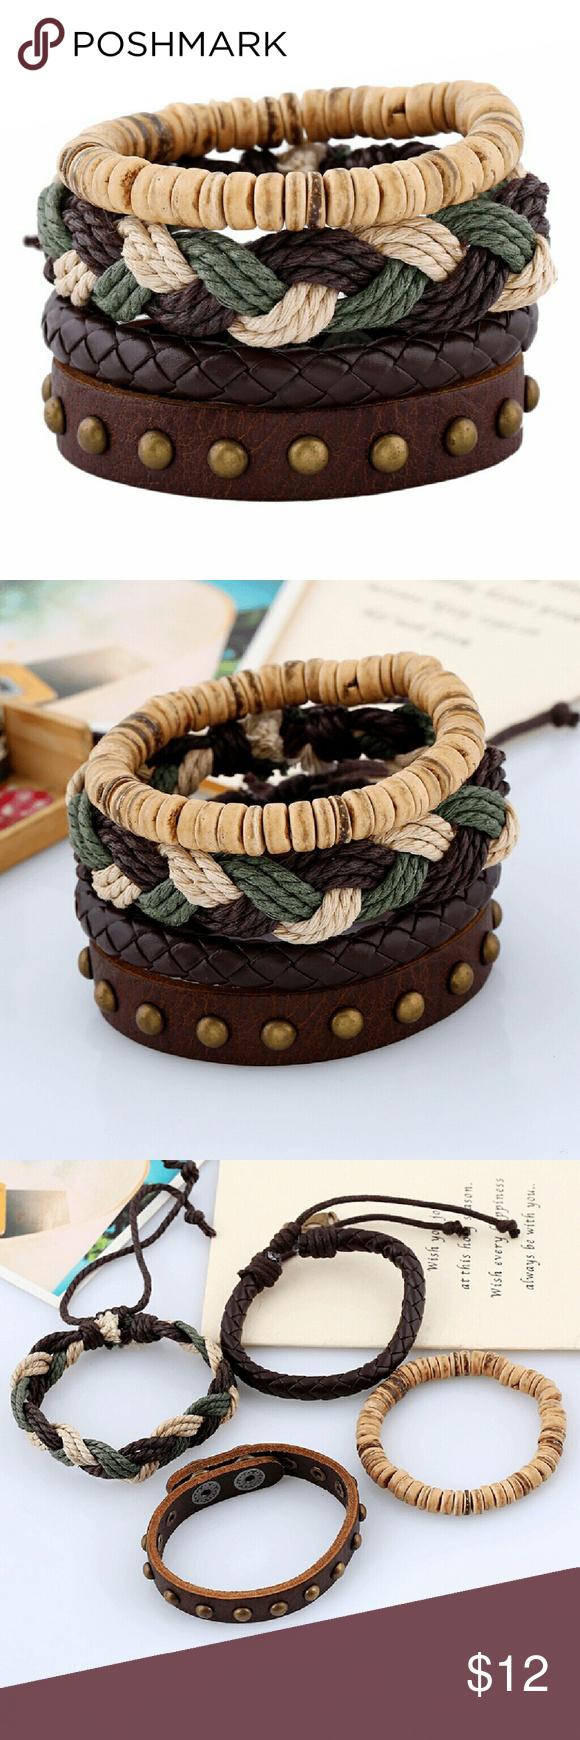 Fashion jewelry bracelets vintage leather leather bracelets and